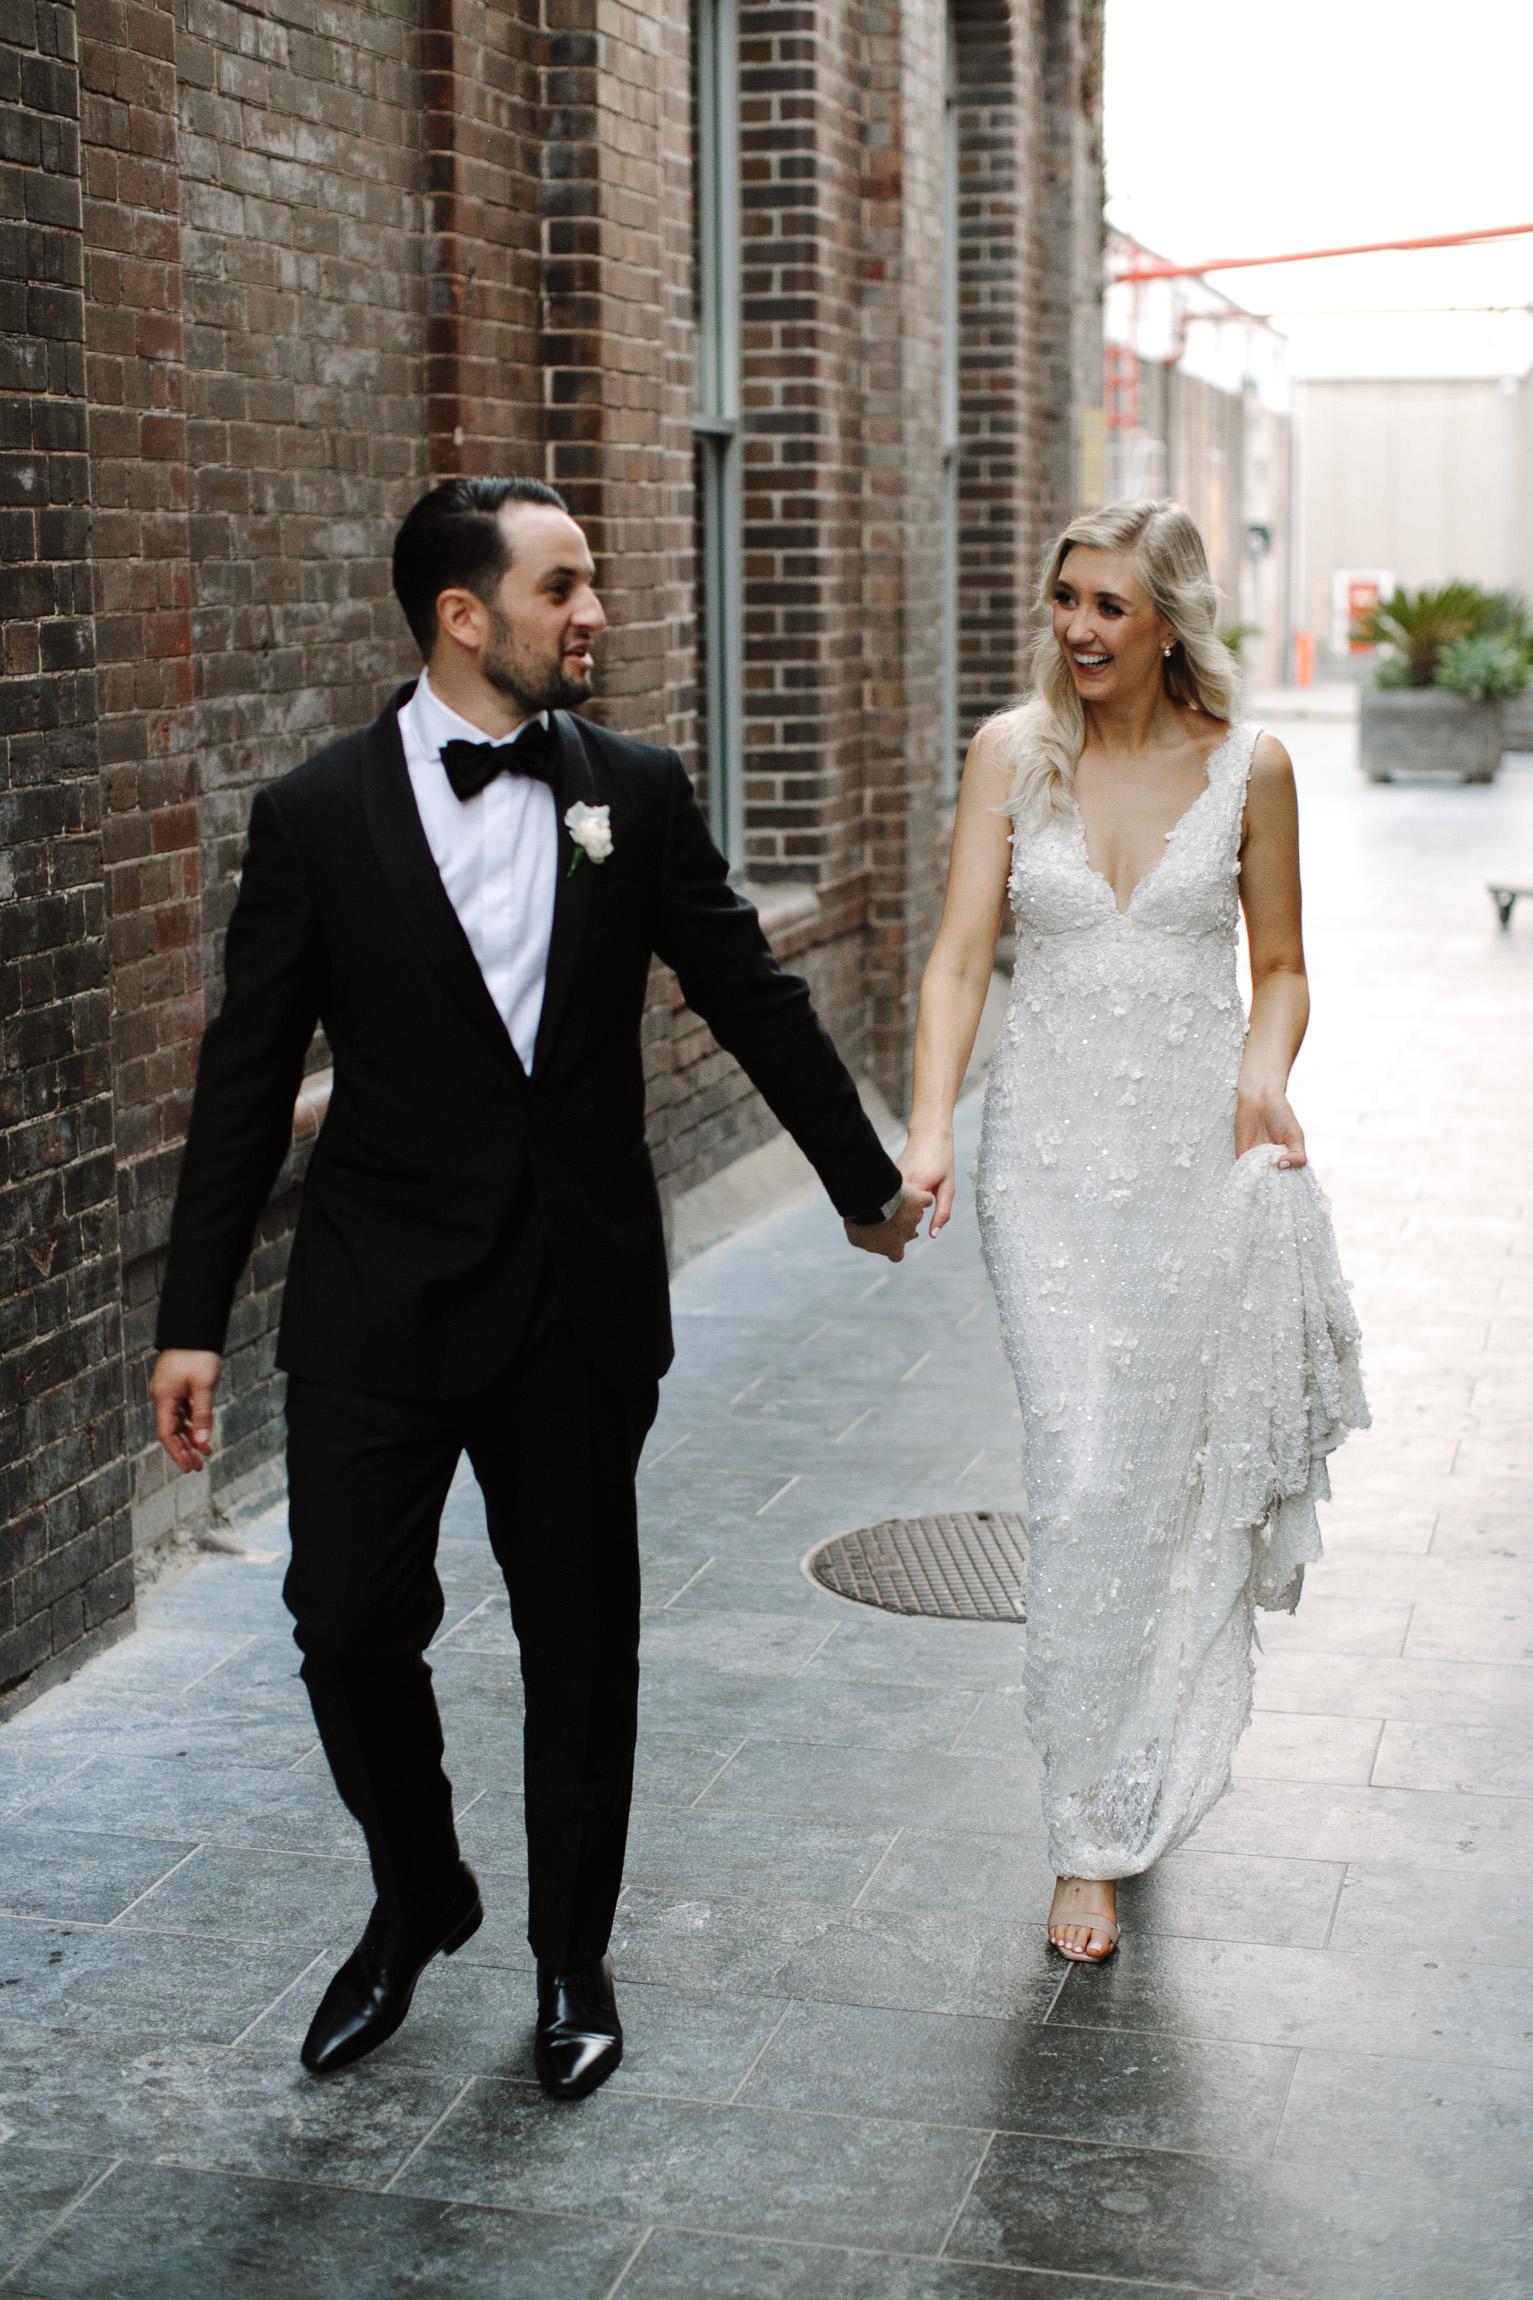 180223_justinaaron_wedding_charlotte_david_h-221.jpg